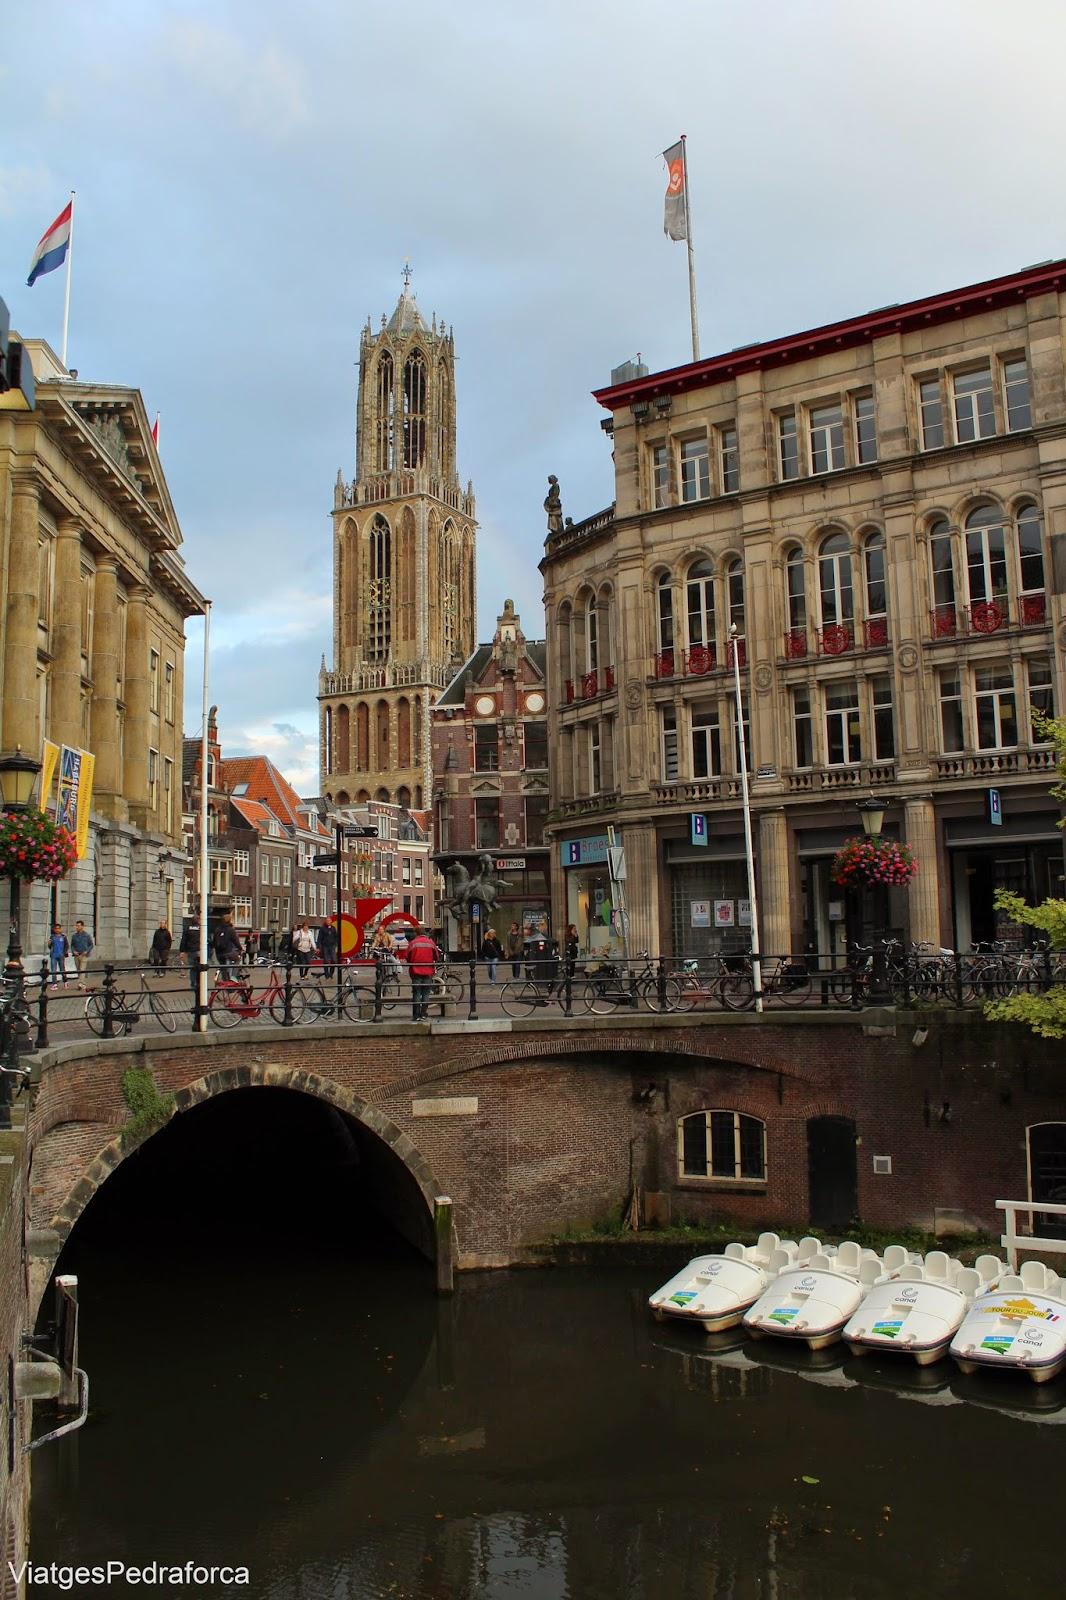 Utrecht Països Baixos Holanda